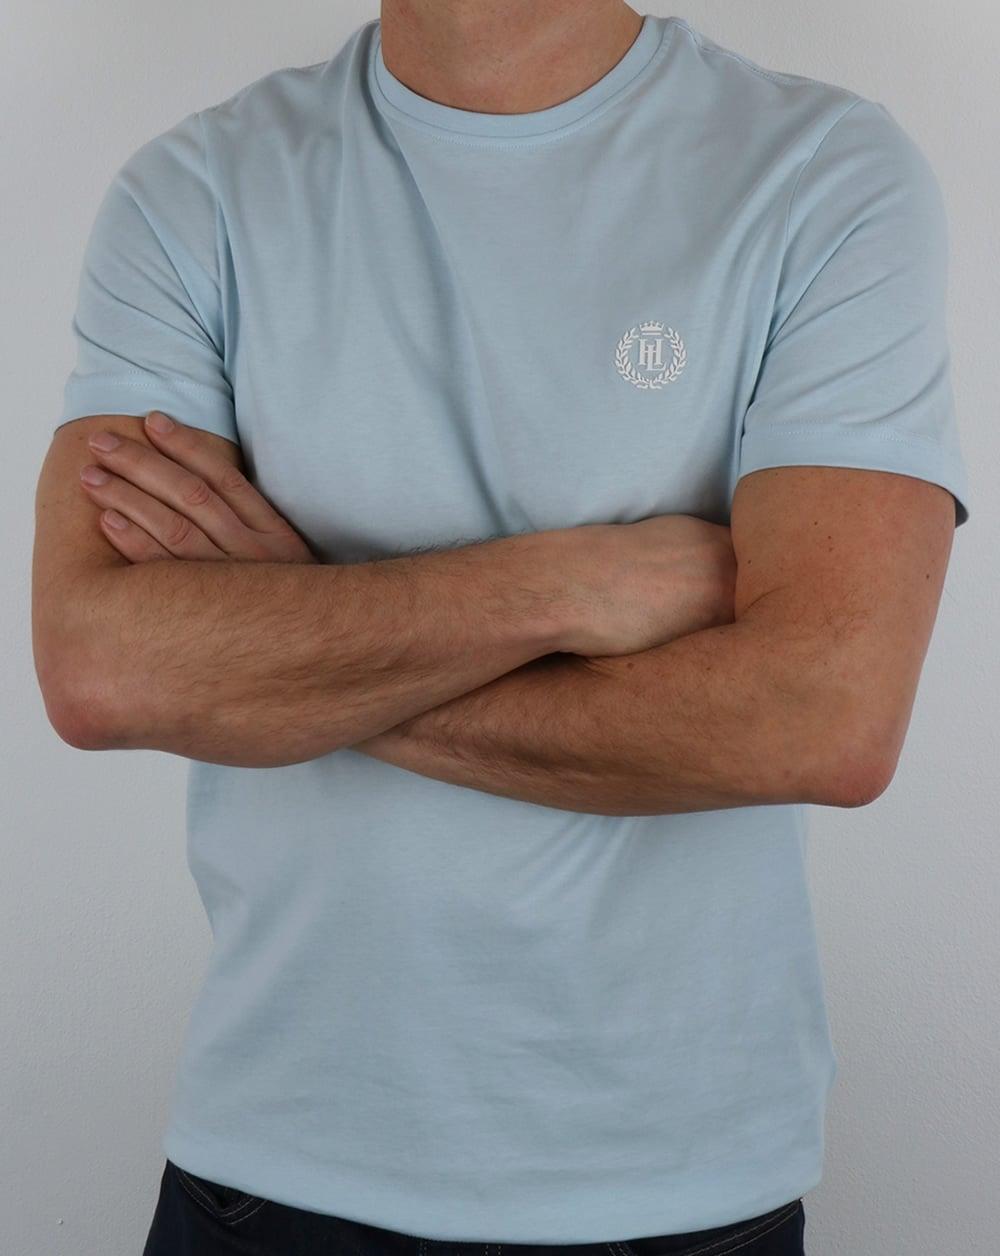 Henri Lloyd Radar T Shirt Pastel Blue,tee,logo,mens,sale